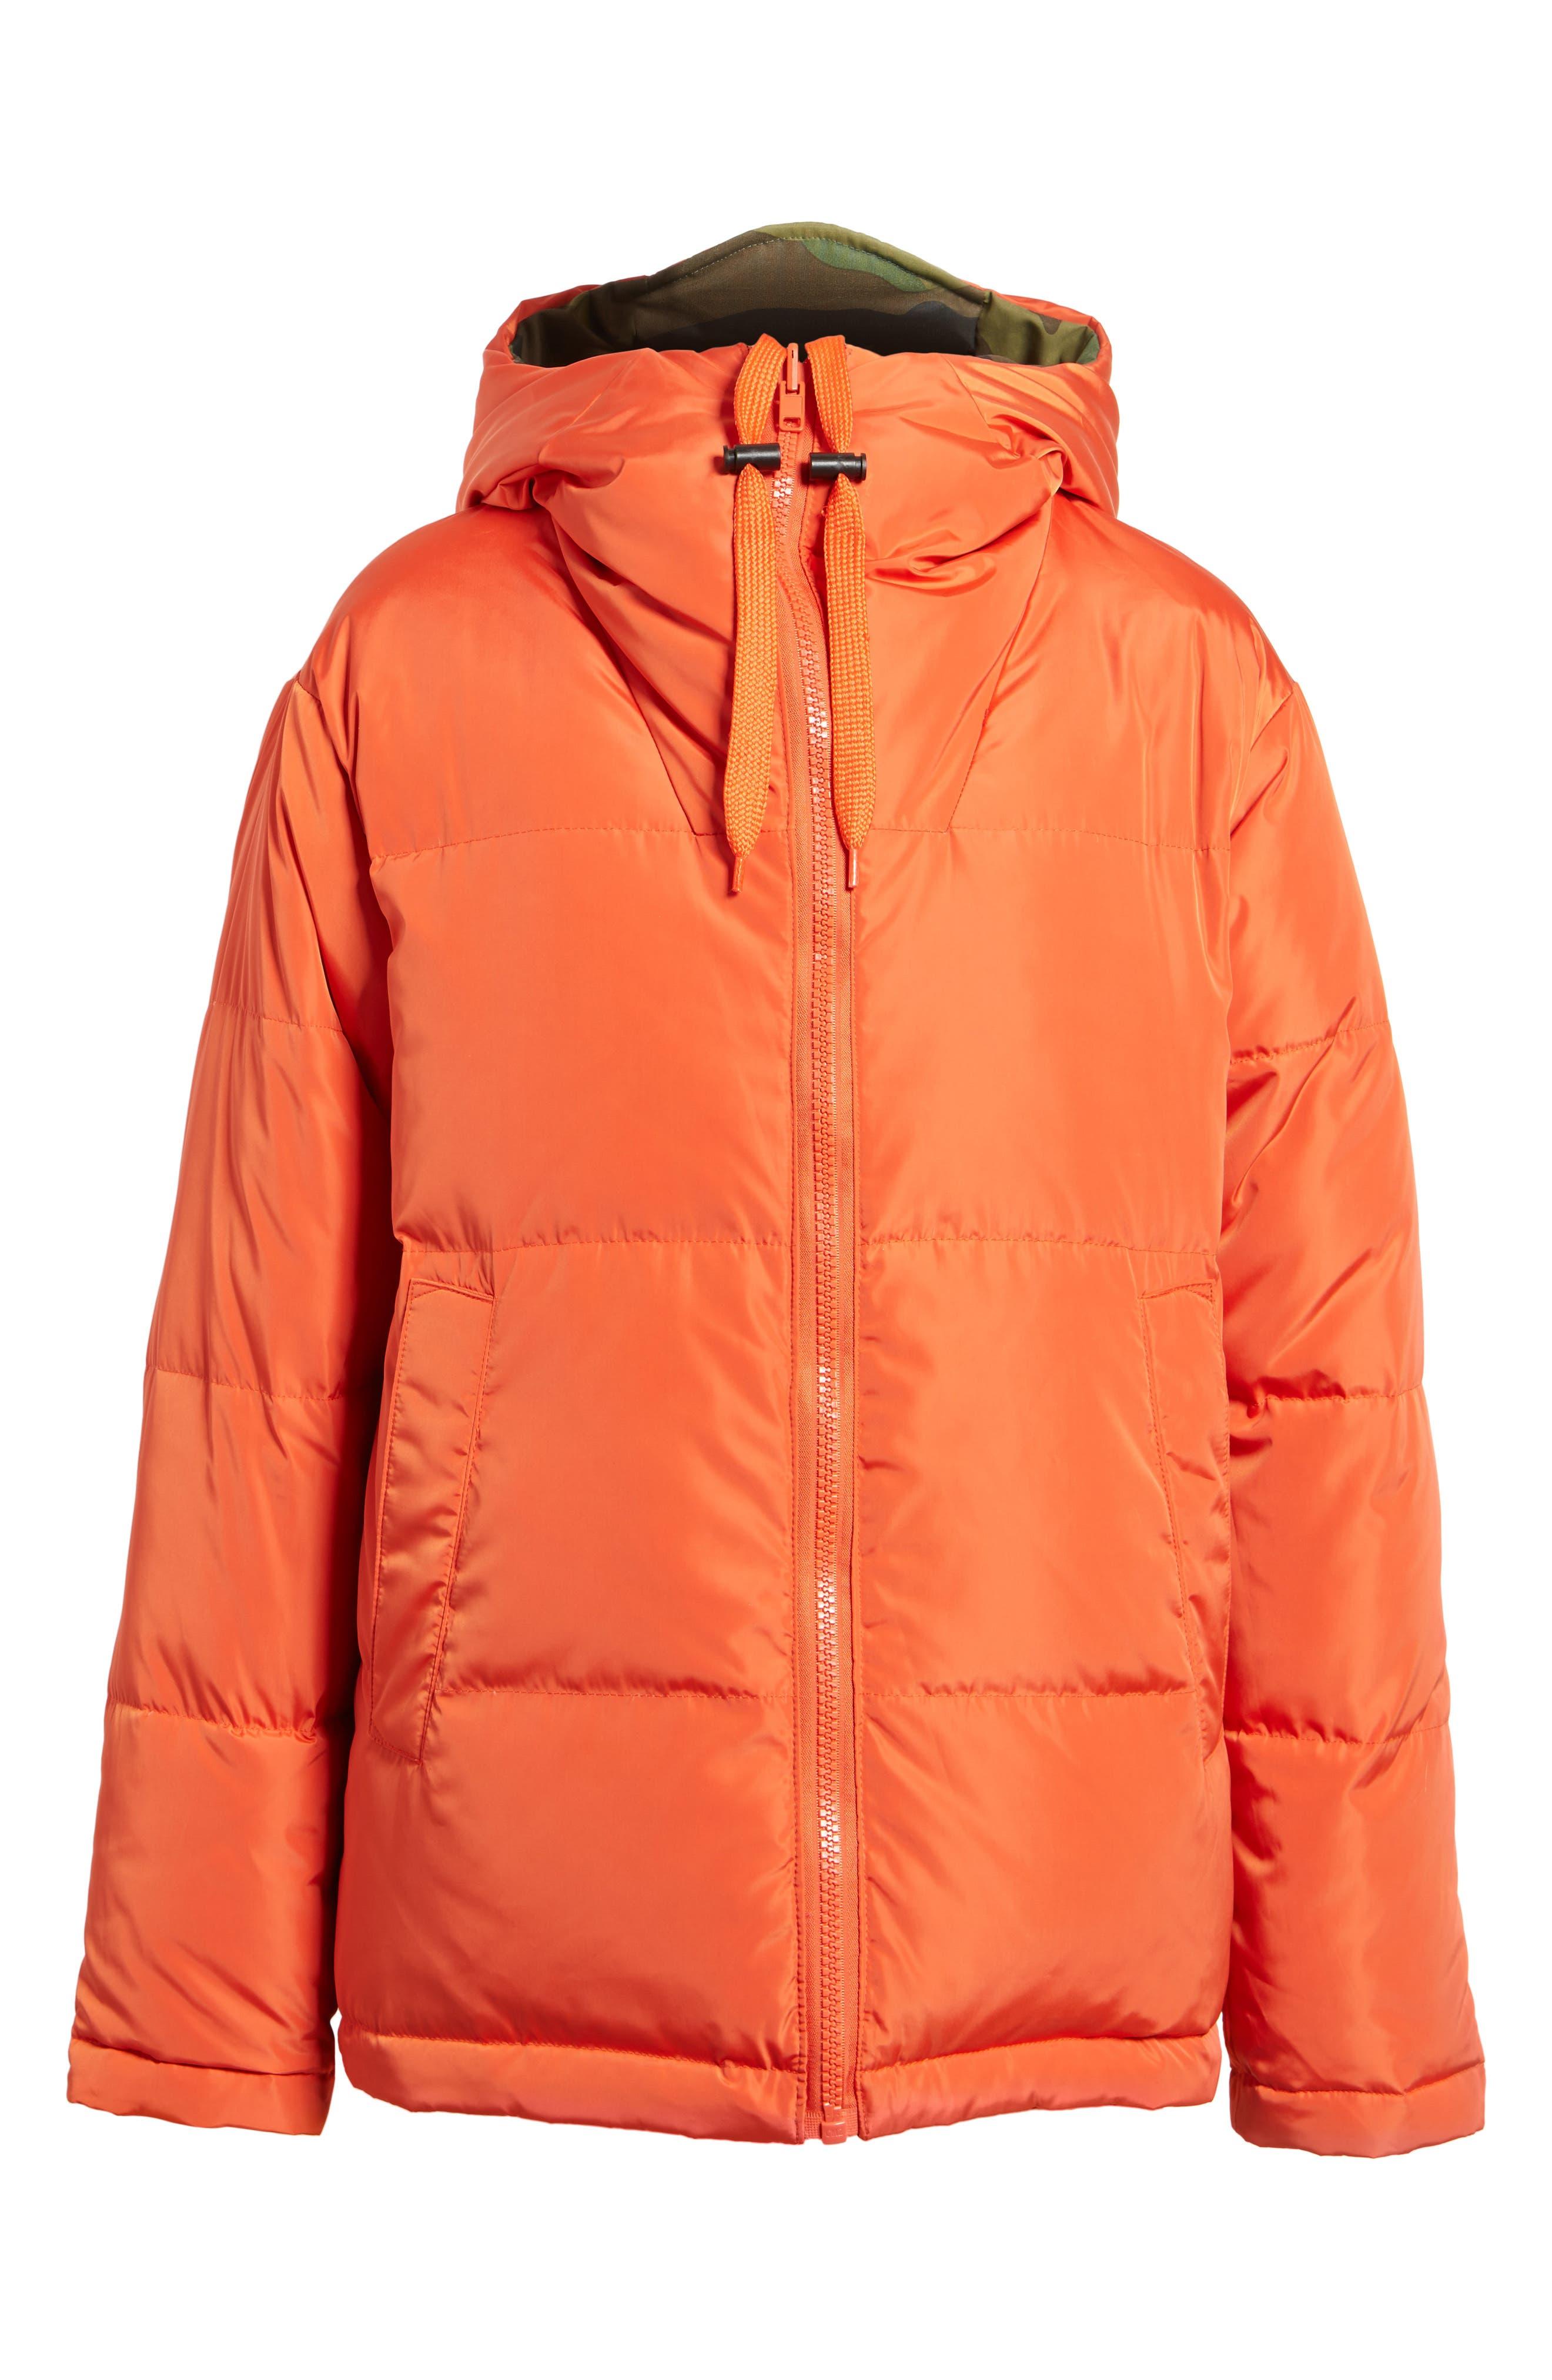 Reversible Puffer Jacket,                             Alternate thumbnail 8, color,                             Camo/ Orange